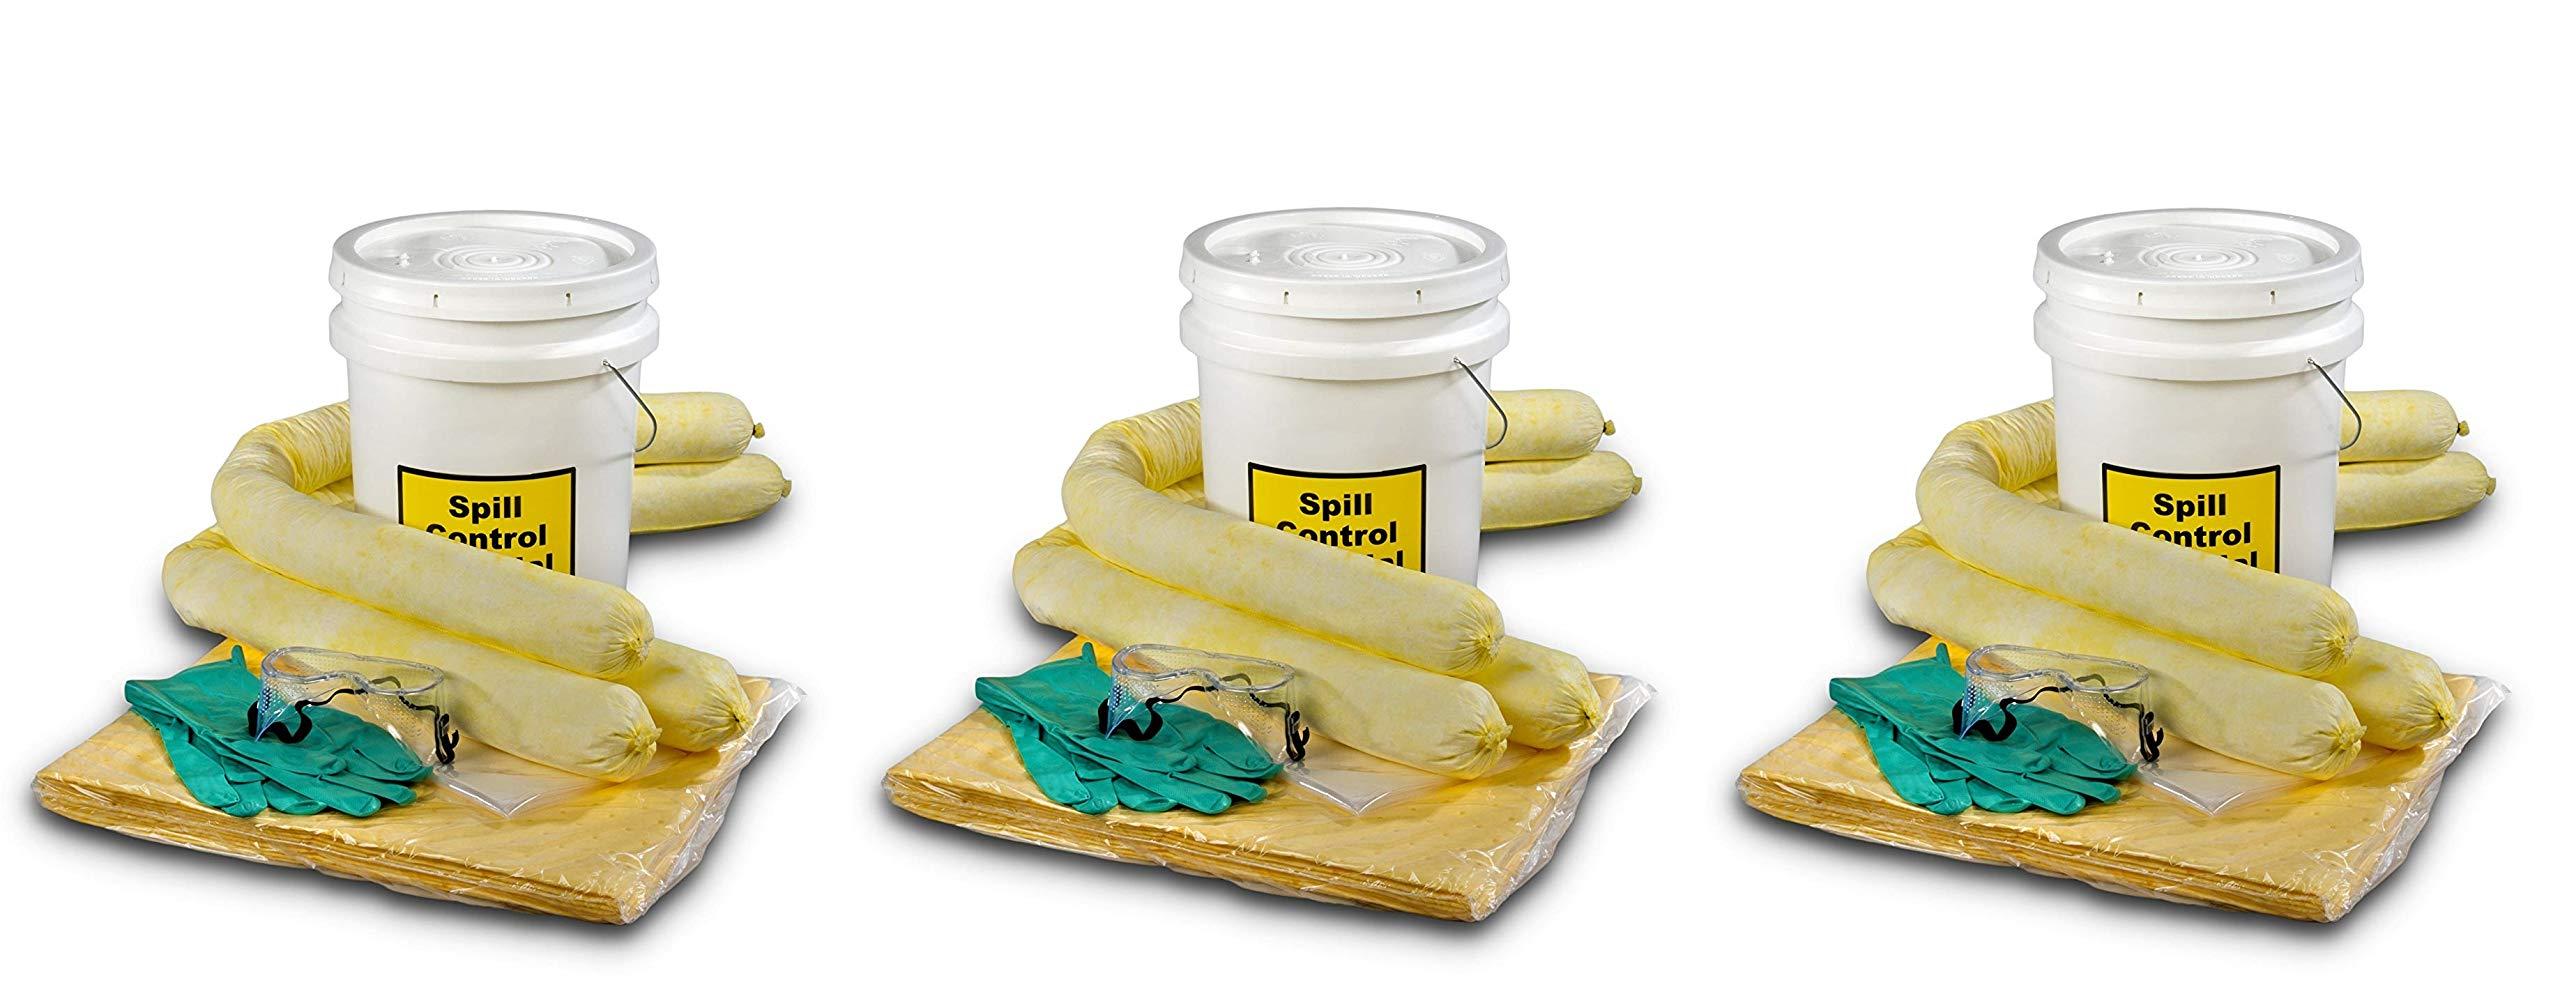 ESP SK-H5 16 Piece 5 Gallons Hazmat Absorbent Spill Kit, 5 Gallons Oil Absorbency (Pack of 3)